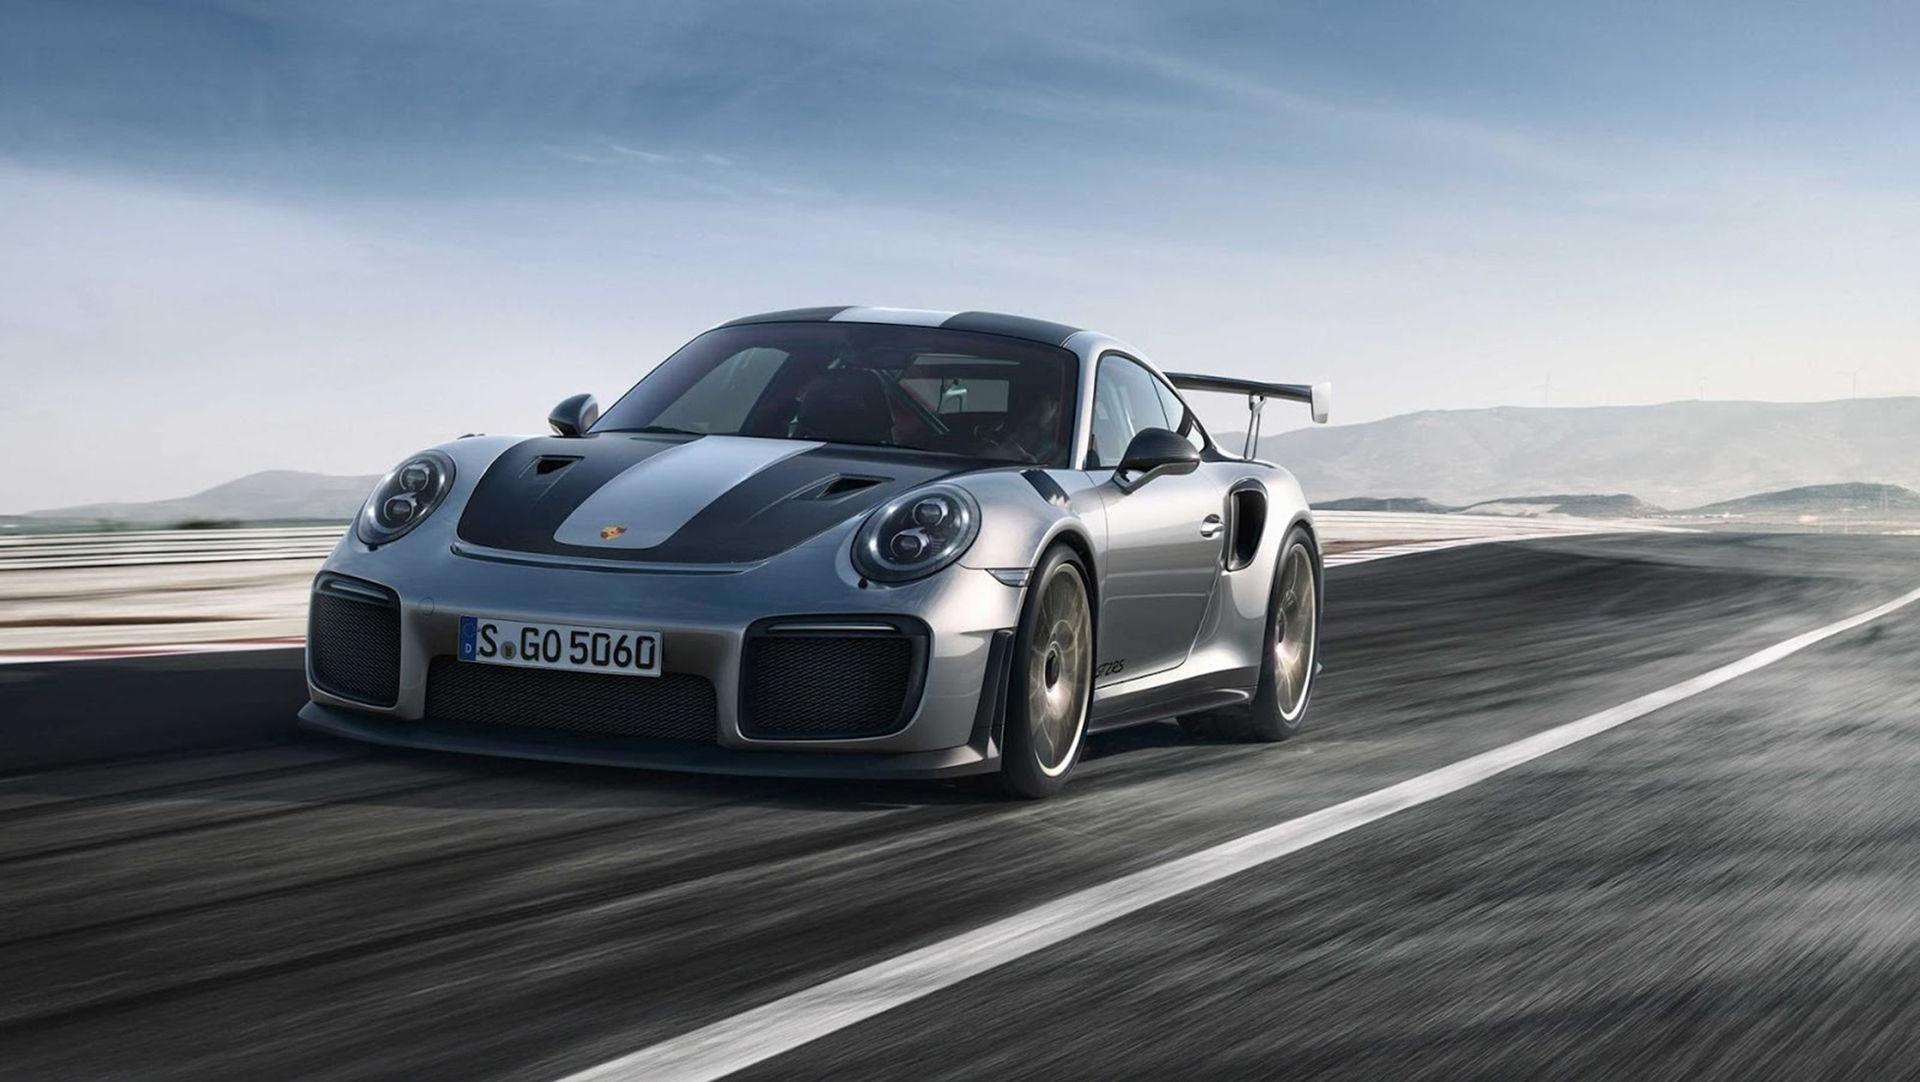 Bilder på nya Porsche 911 GT2 RS